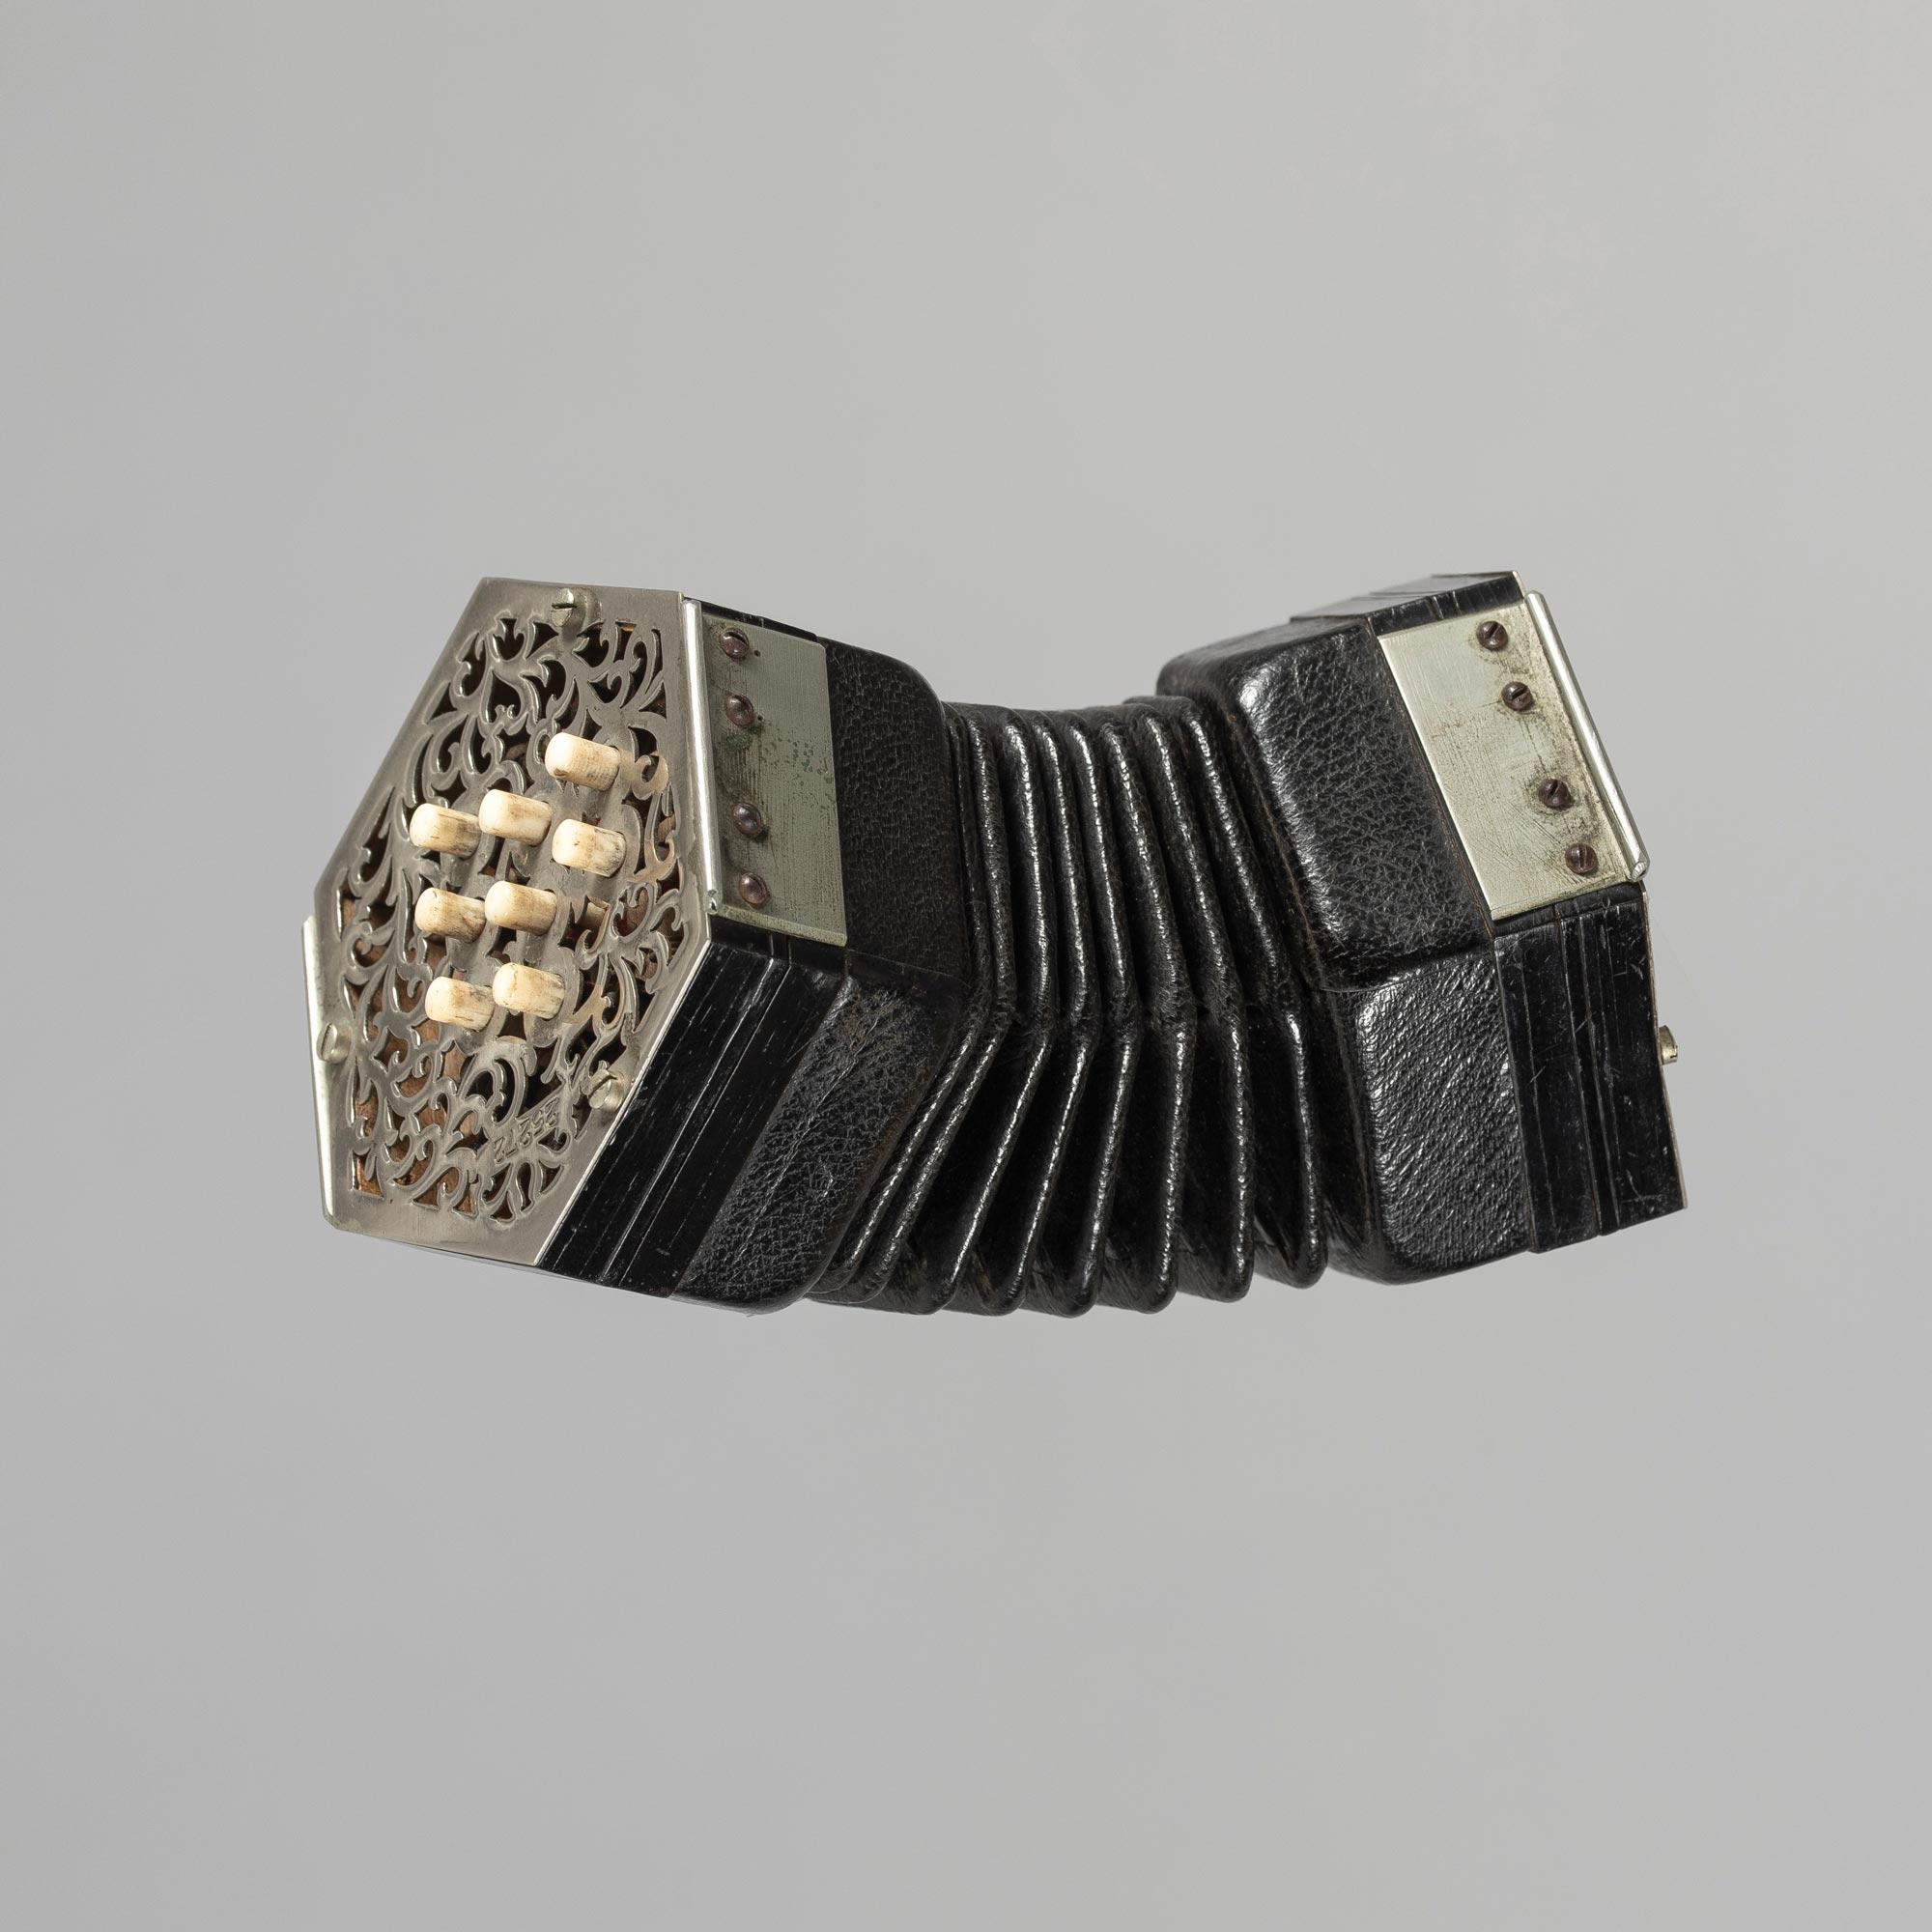 English concertina miniature de WHEATSTONE